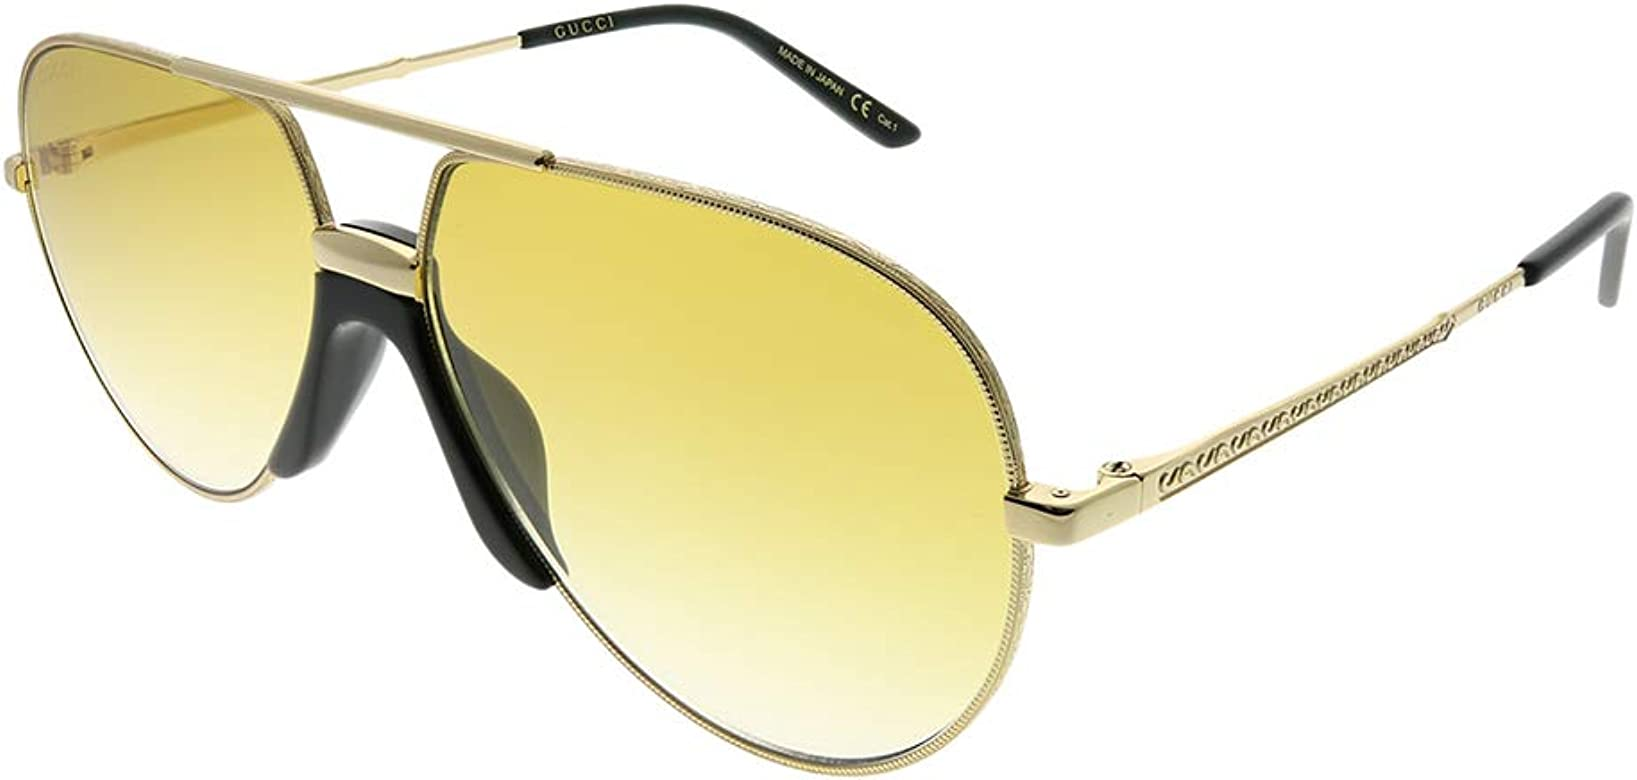 a4080f77bf2 Amazon.com  Gucci GG 0432S 003 Gold Metal Aviator Sunglasses Yellow ...